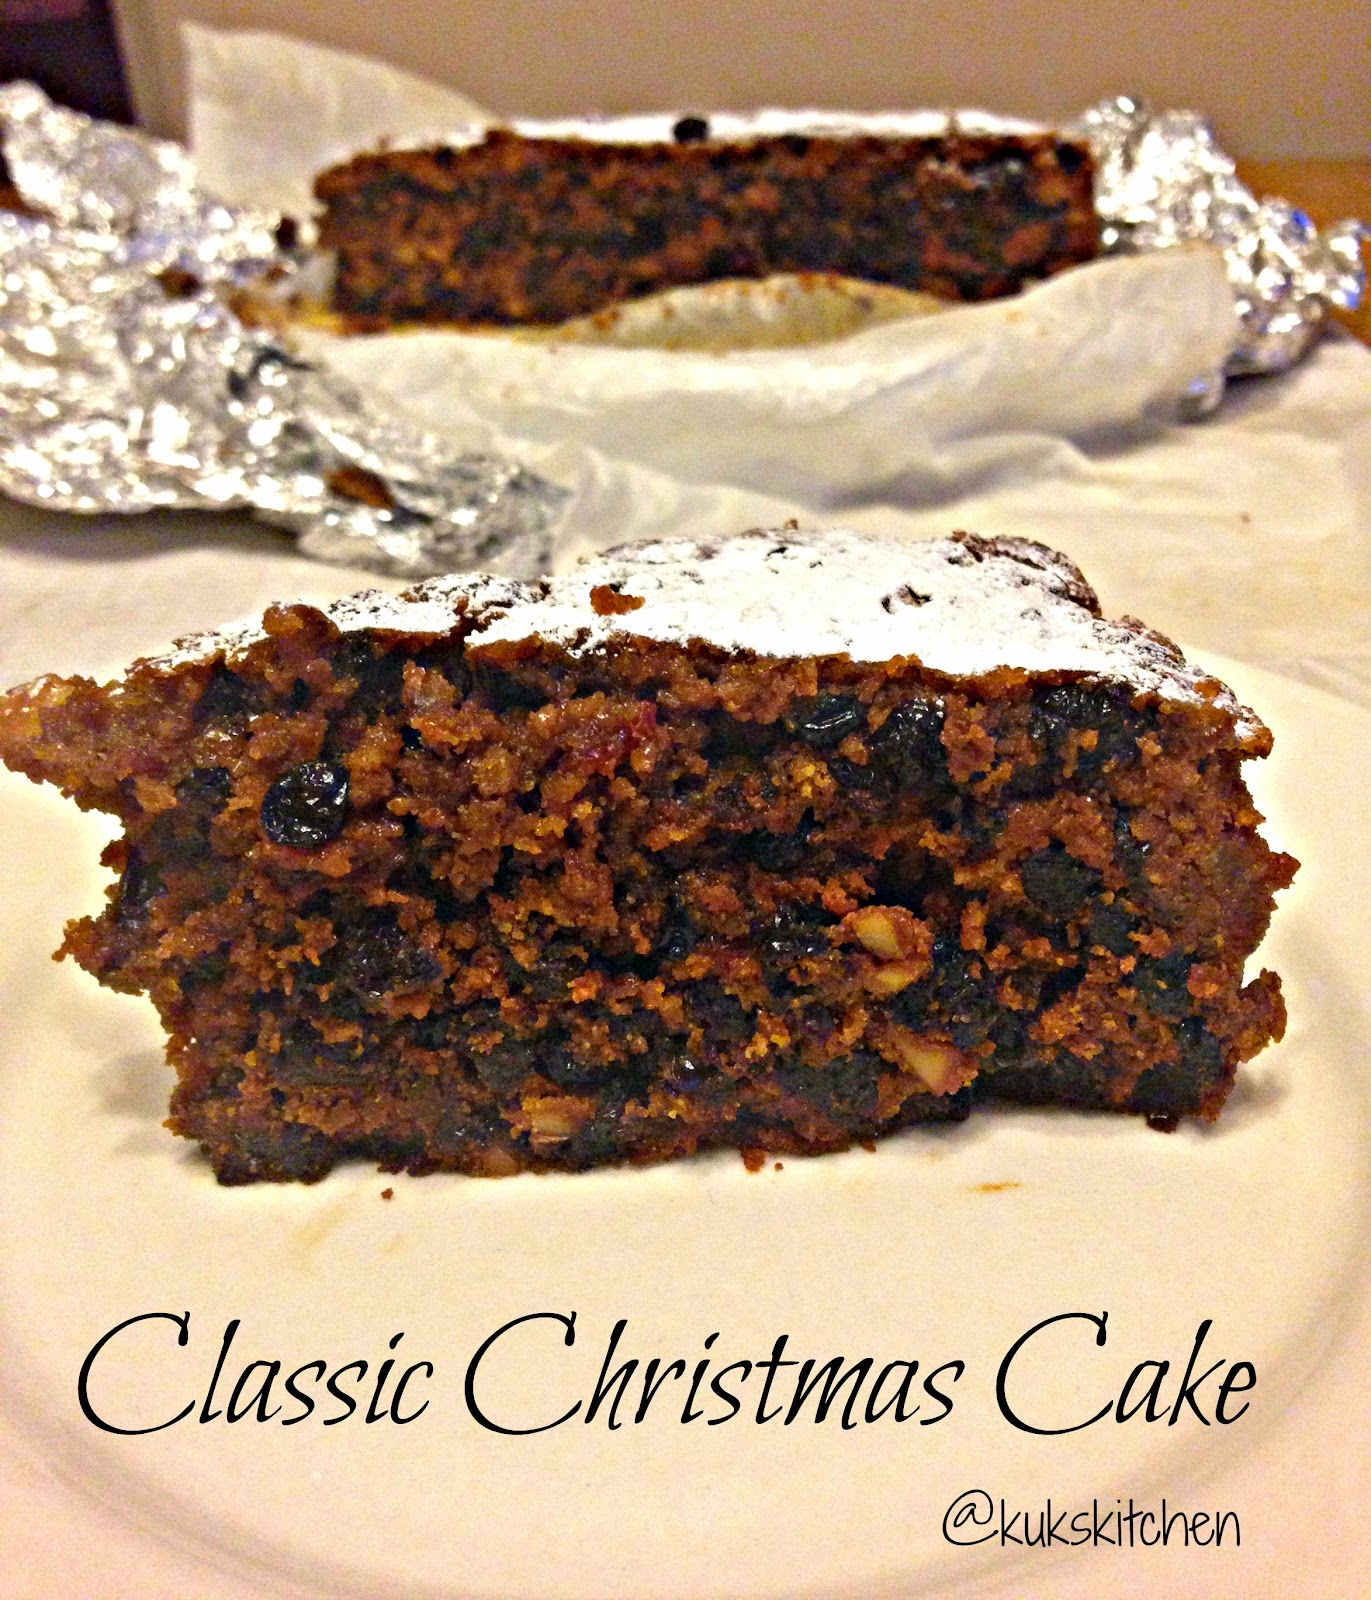 lassic Christmas cake  |  Delia Smith' sChristmas cake  |  Kukskitchen